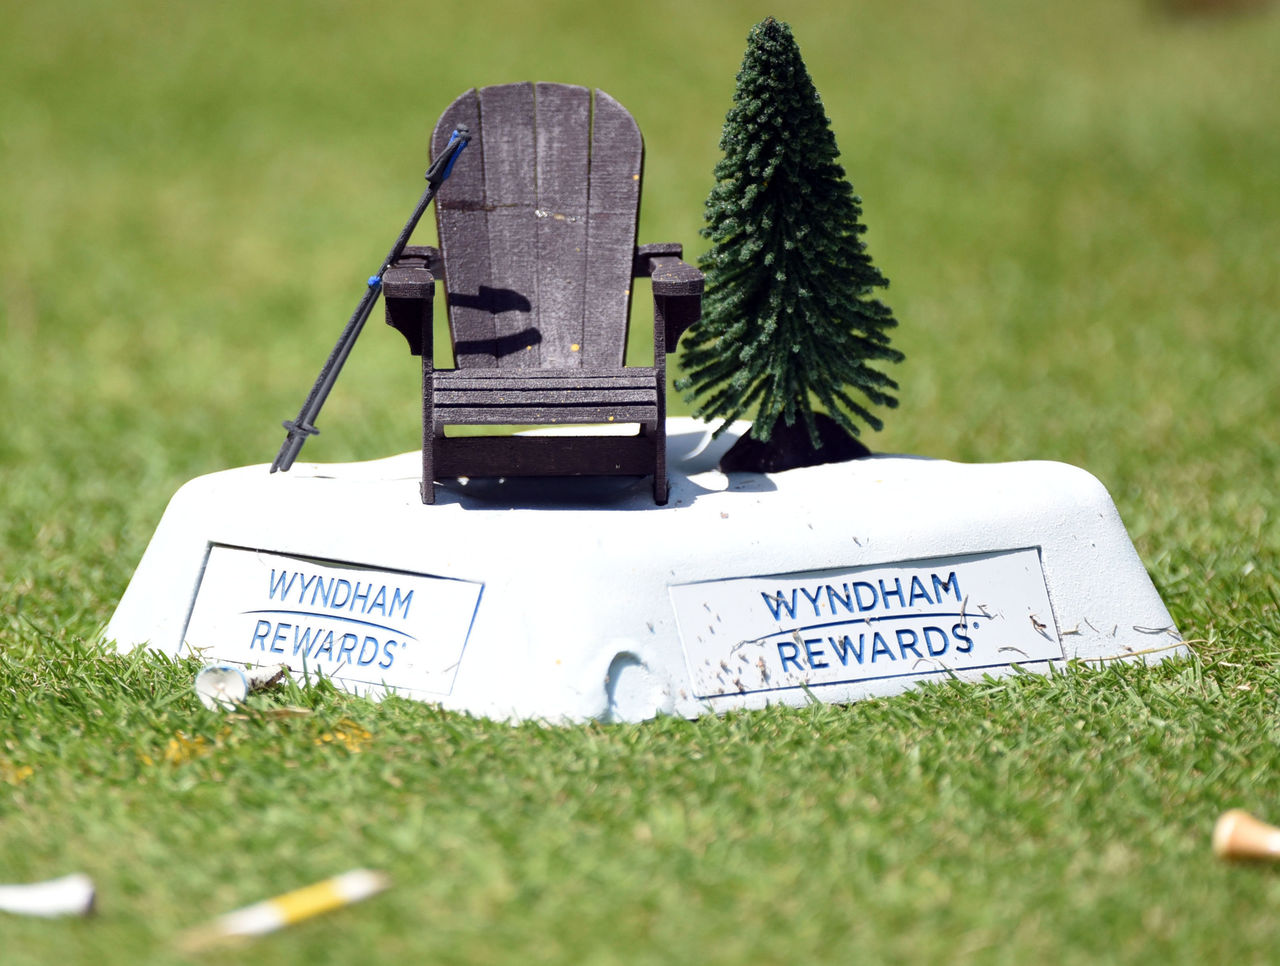 Cropped 2017 08 19t190926z 1783953431 nocid rtrmadp 3 pga wyndham championship third round